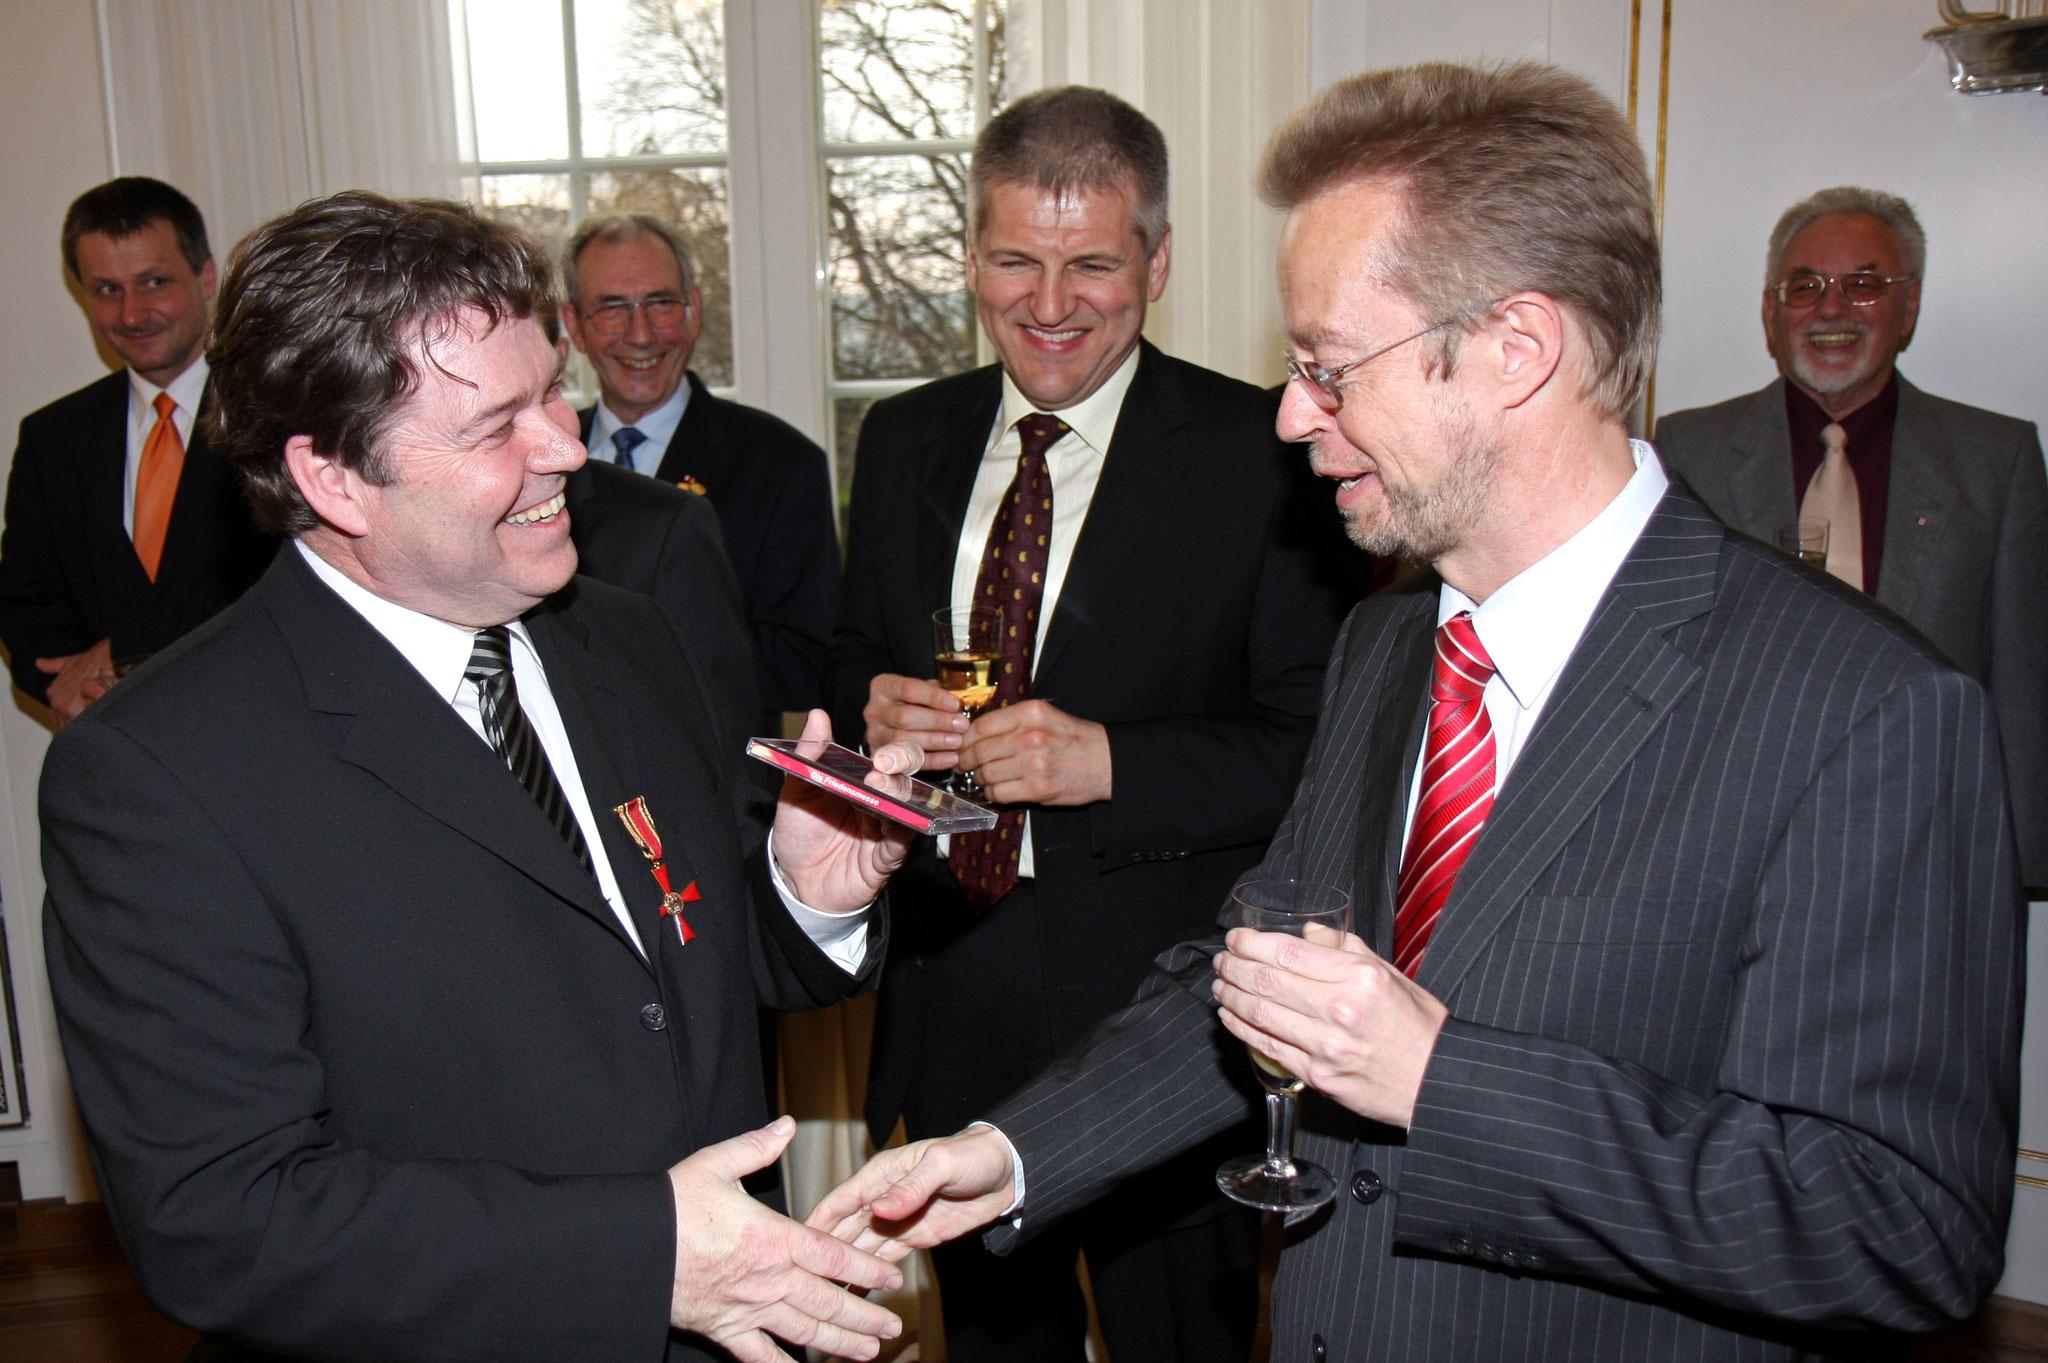 W. Dippon - Gerd Maisch - VV KSK LB Dr. Heinz Werner Schulte